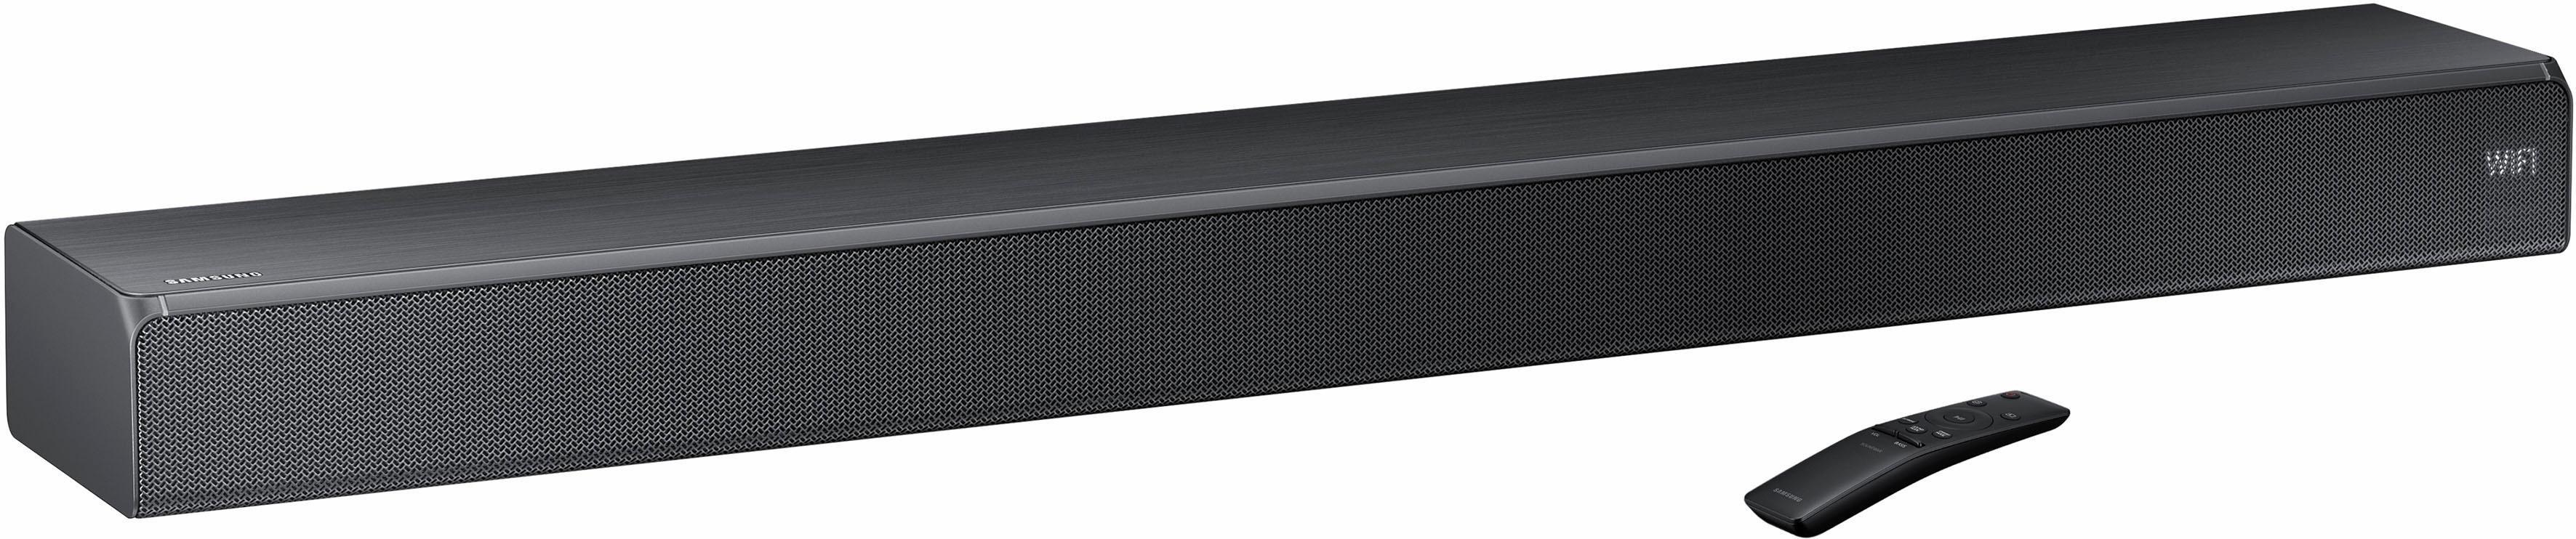 SAMSUNG HW-MS550/EN 2.0 soundbar (MultiRoom, Bluetooth, wifi) nu online bestellen